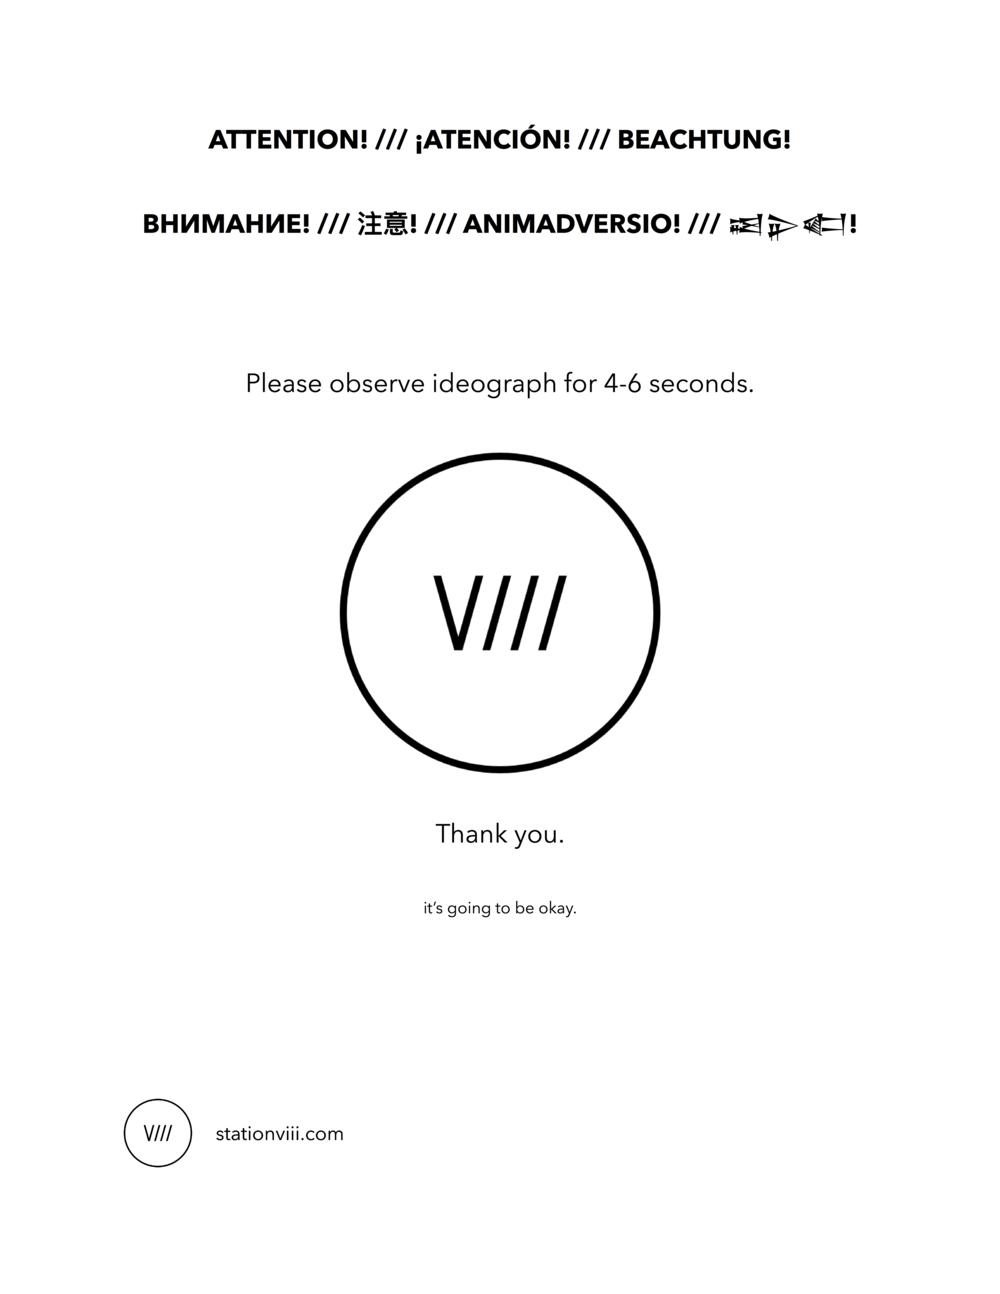 stationVIII_flyer_1.png